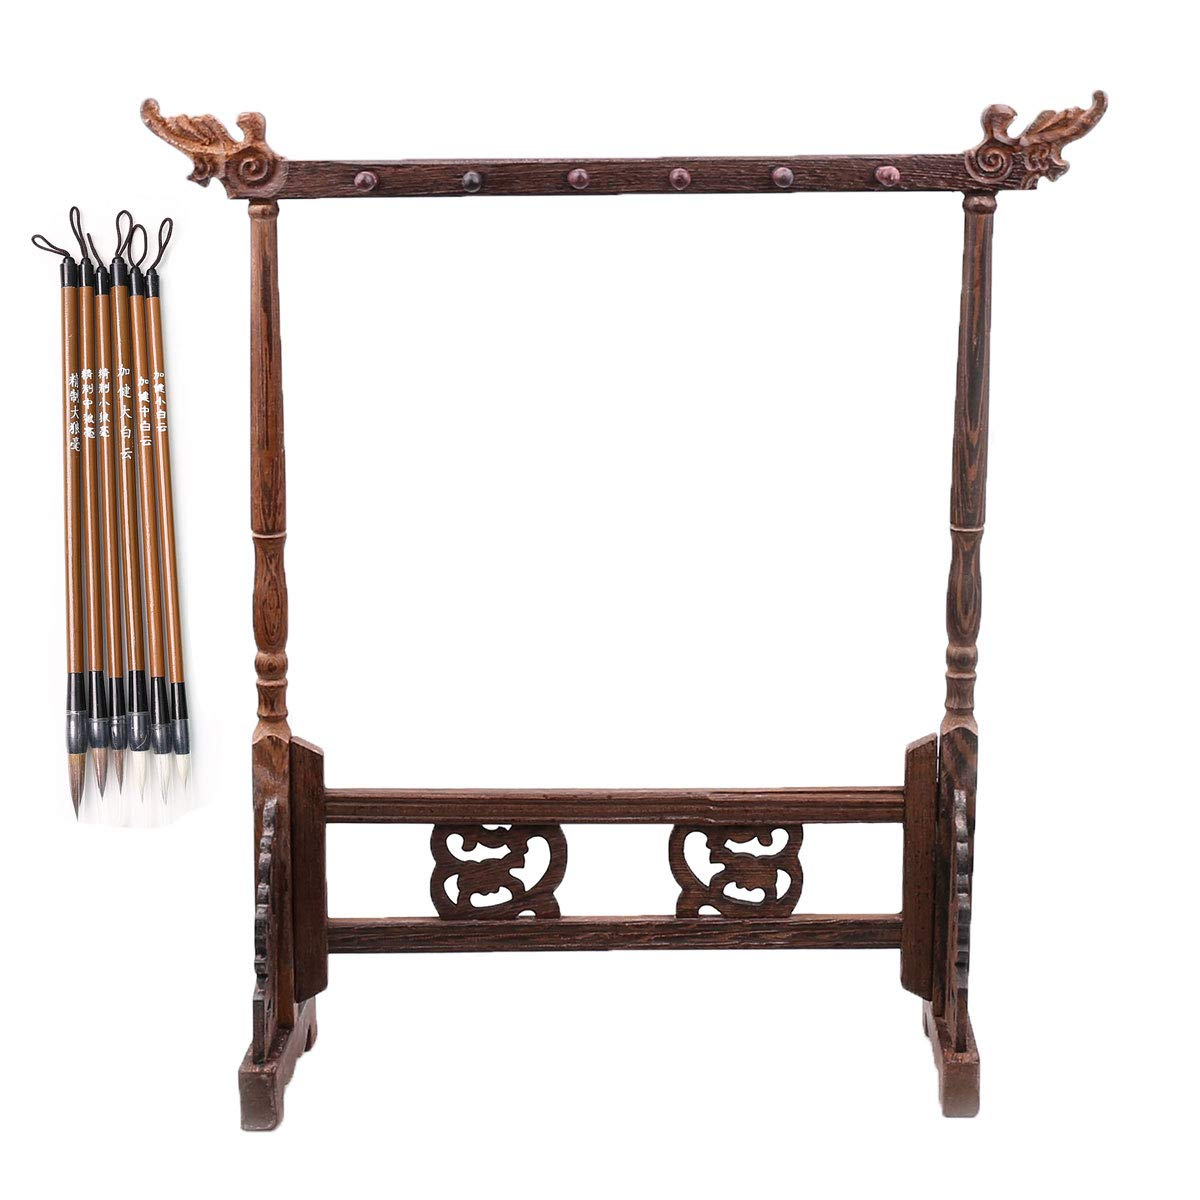 Father's Day Gift,12-pin wenge Brush Holder/Wood Penholder Pen Hanging/Calligraphy / Rosewood 12 Pin Calligraphy Sumi Drawing Kanji Brush Pen Hanger